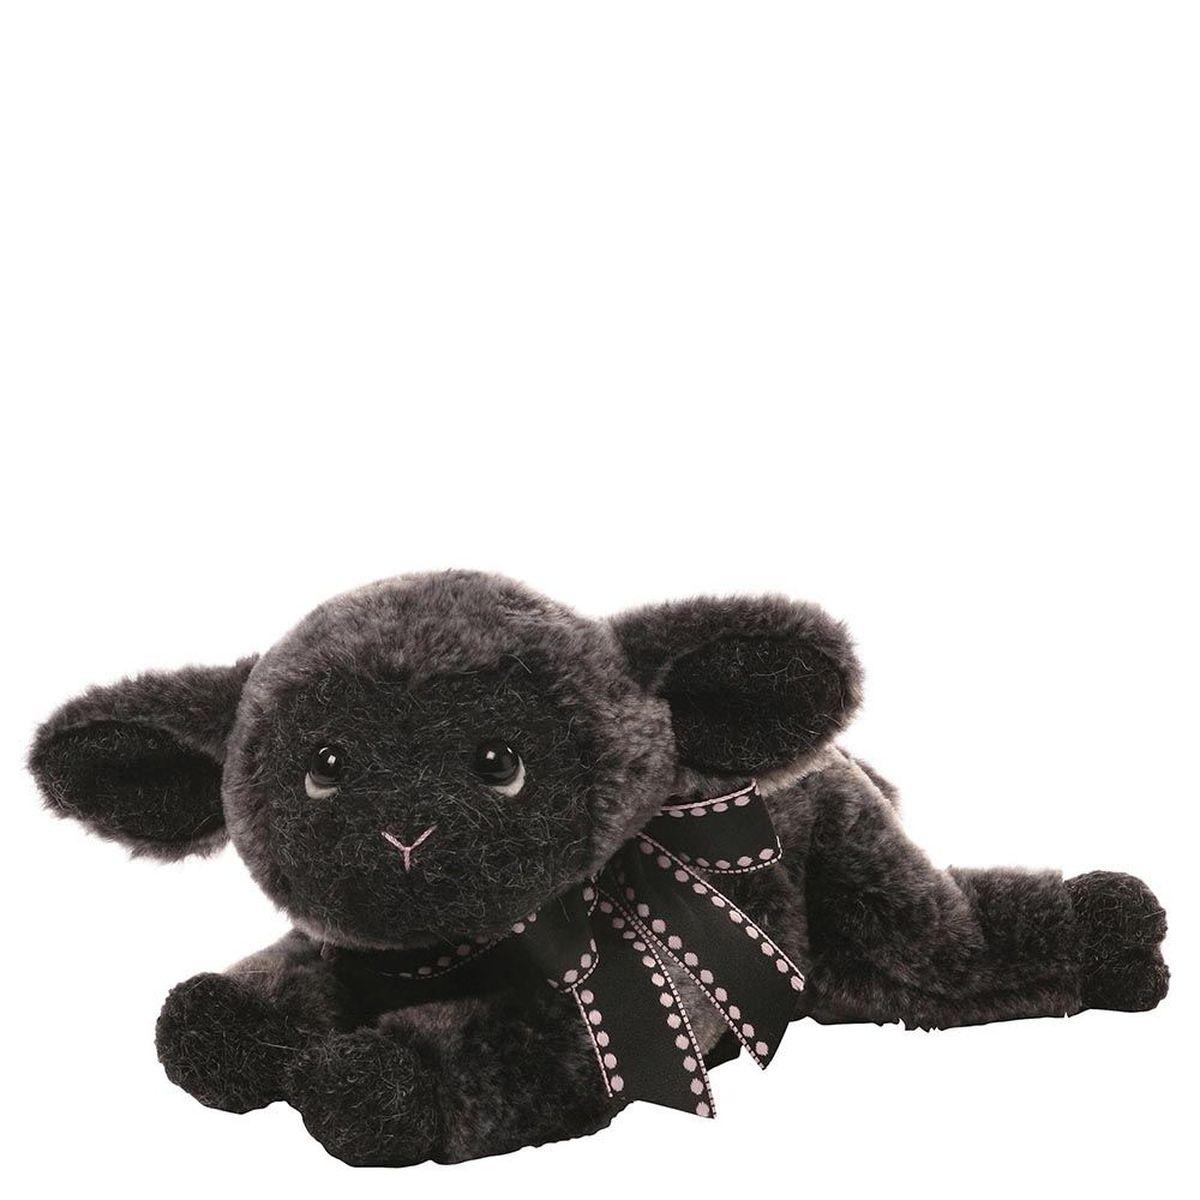 Gund Мягкая игрушка Amalya Black Lamb 12,5 см gund мягкая игрушка arlo bear 18 см